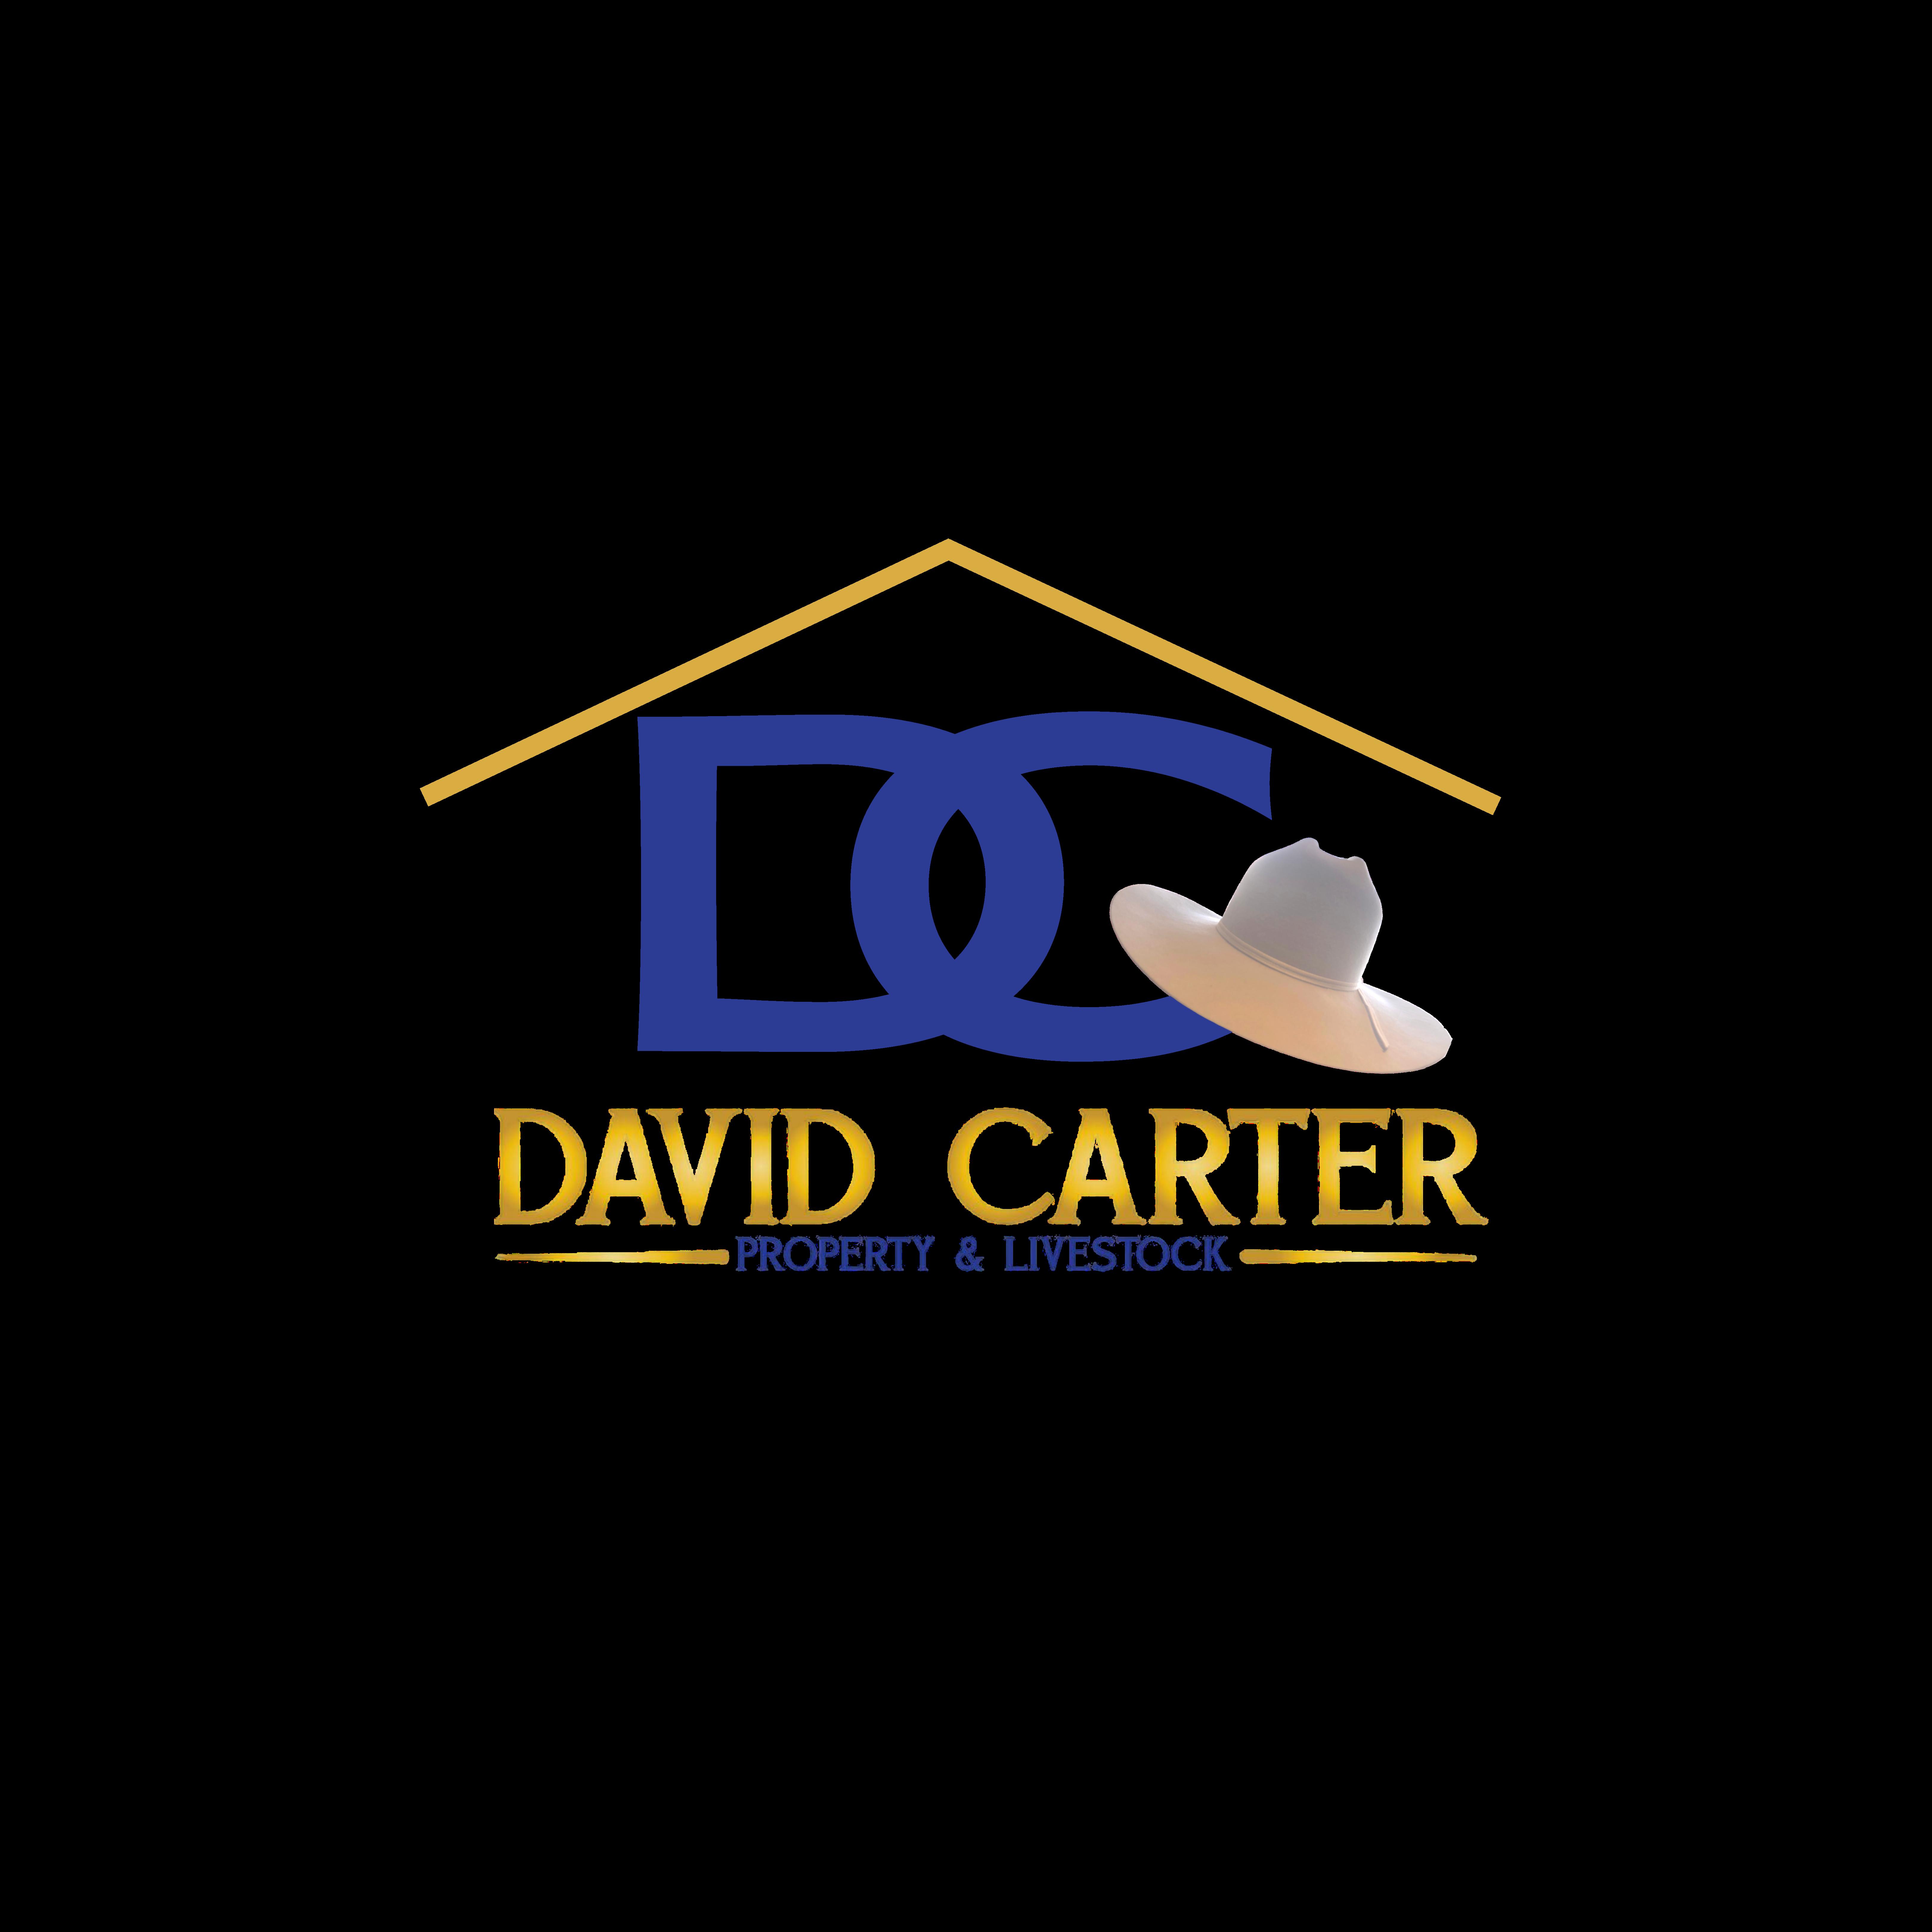 David Carter Property & Livestock